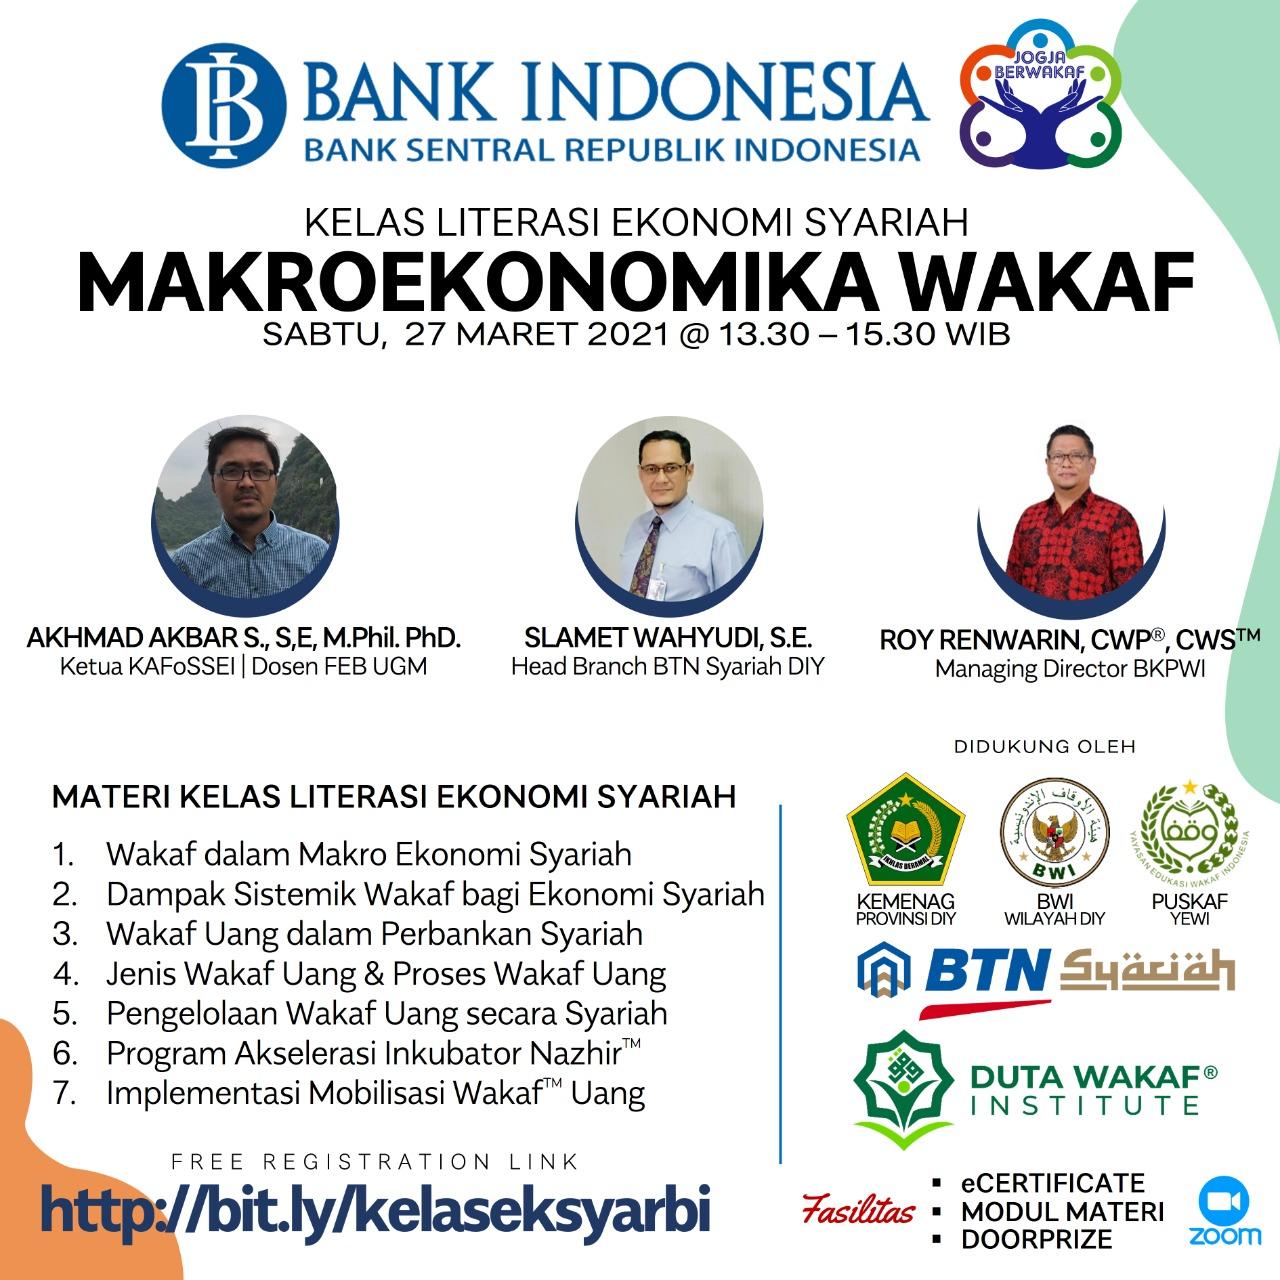 KELAS LITERASI EKONOMI SYARIAH BANK INDONESIA